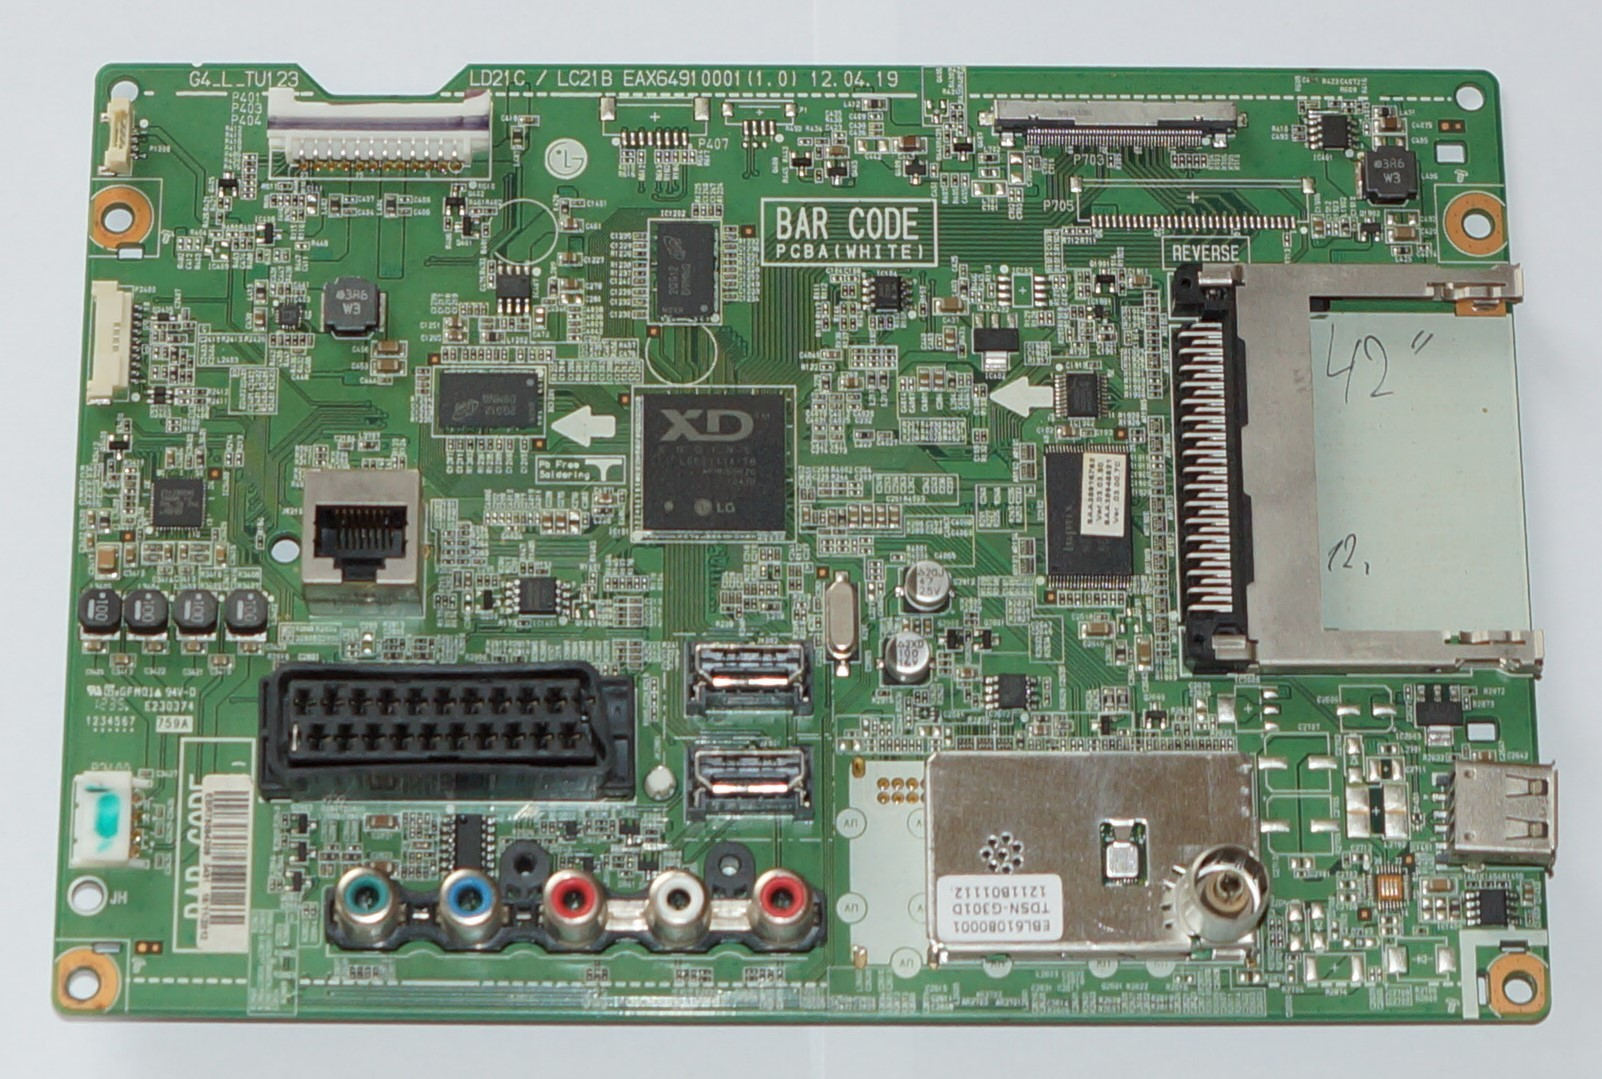 Mainboard EAX64910001(1.0) EBR75084309 телевизора LG